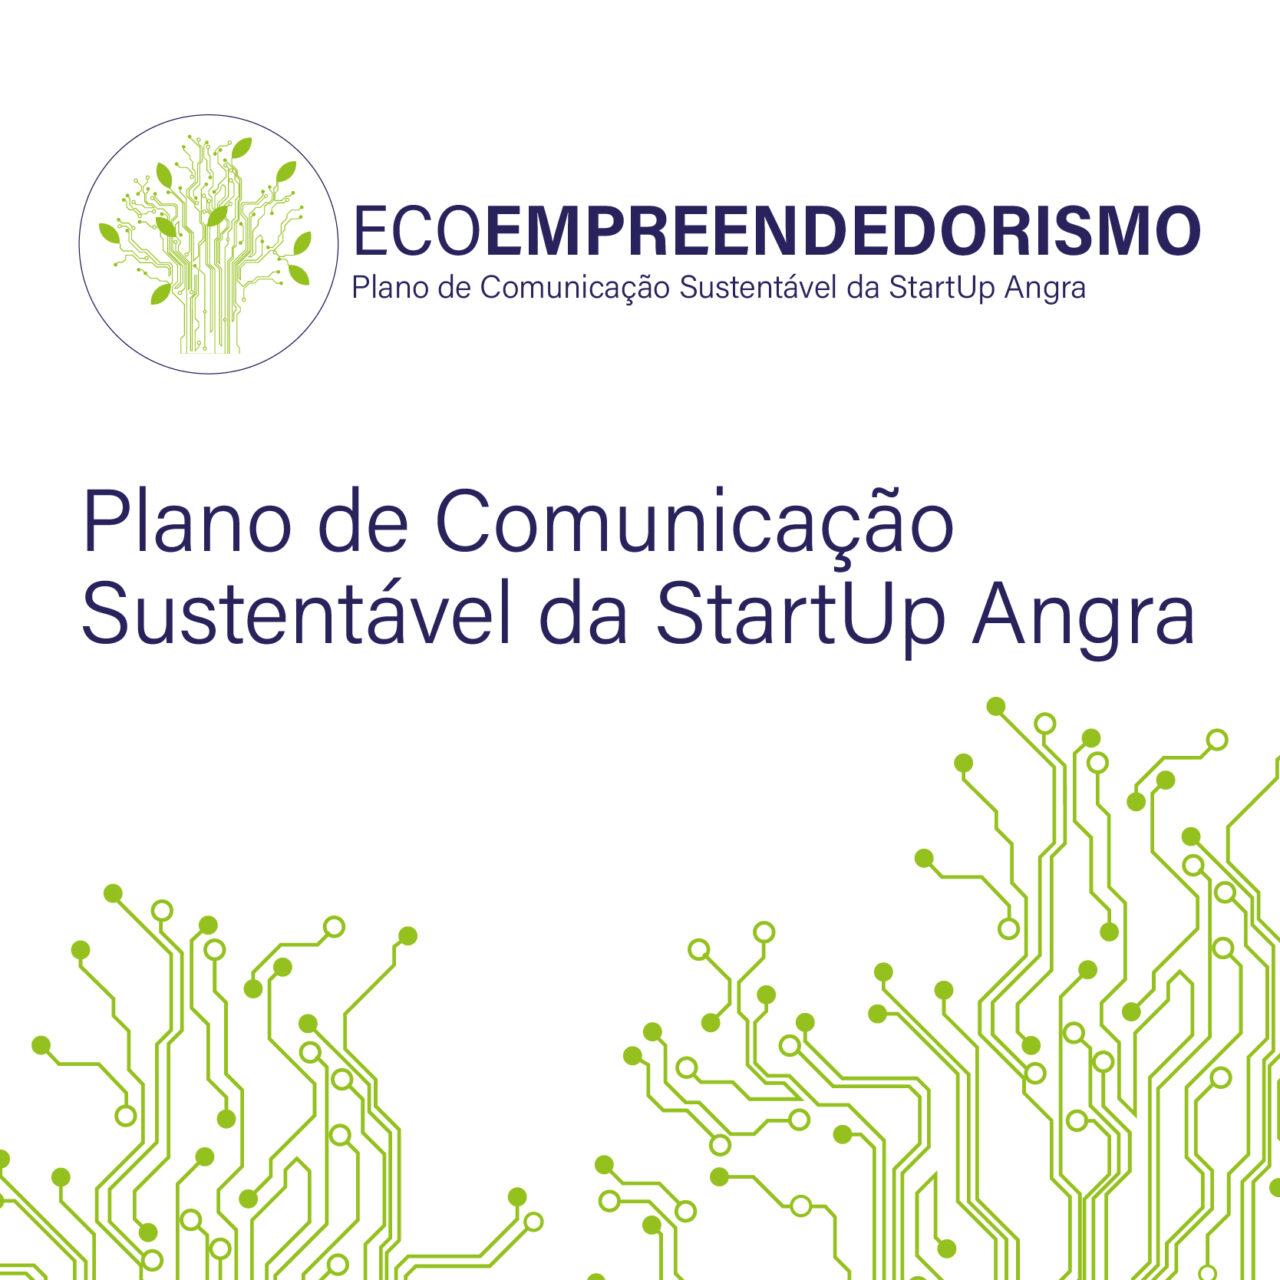 https://www.startupangra.com/wp-content/uploads/2021/02/eco_post-1280x1280.jpg